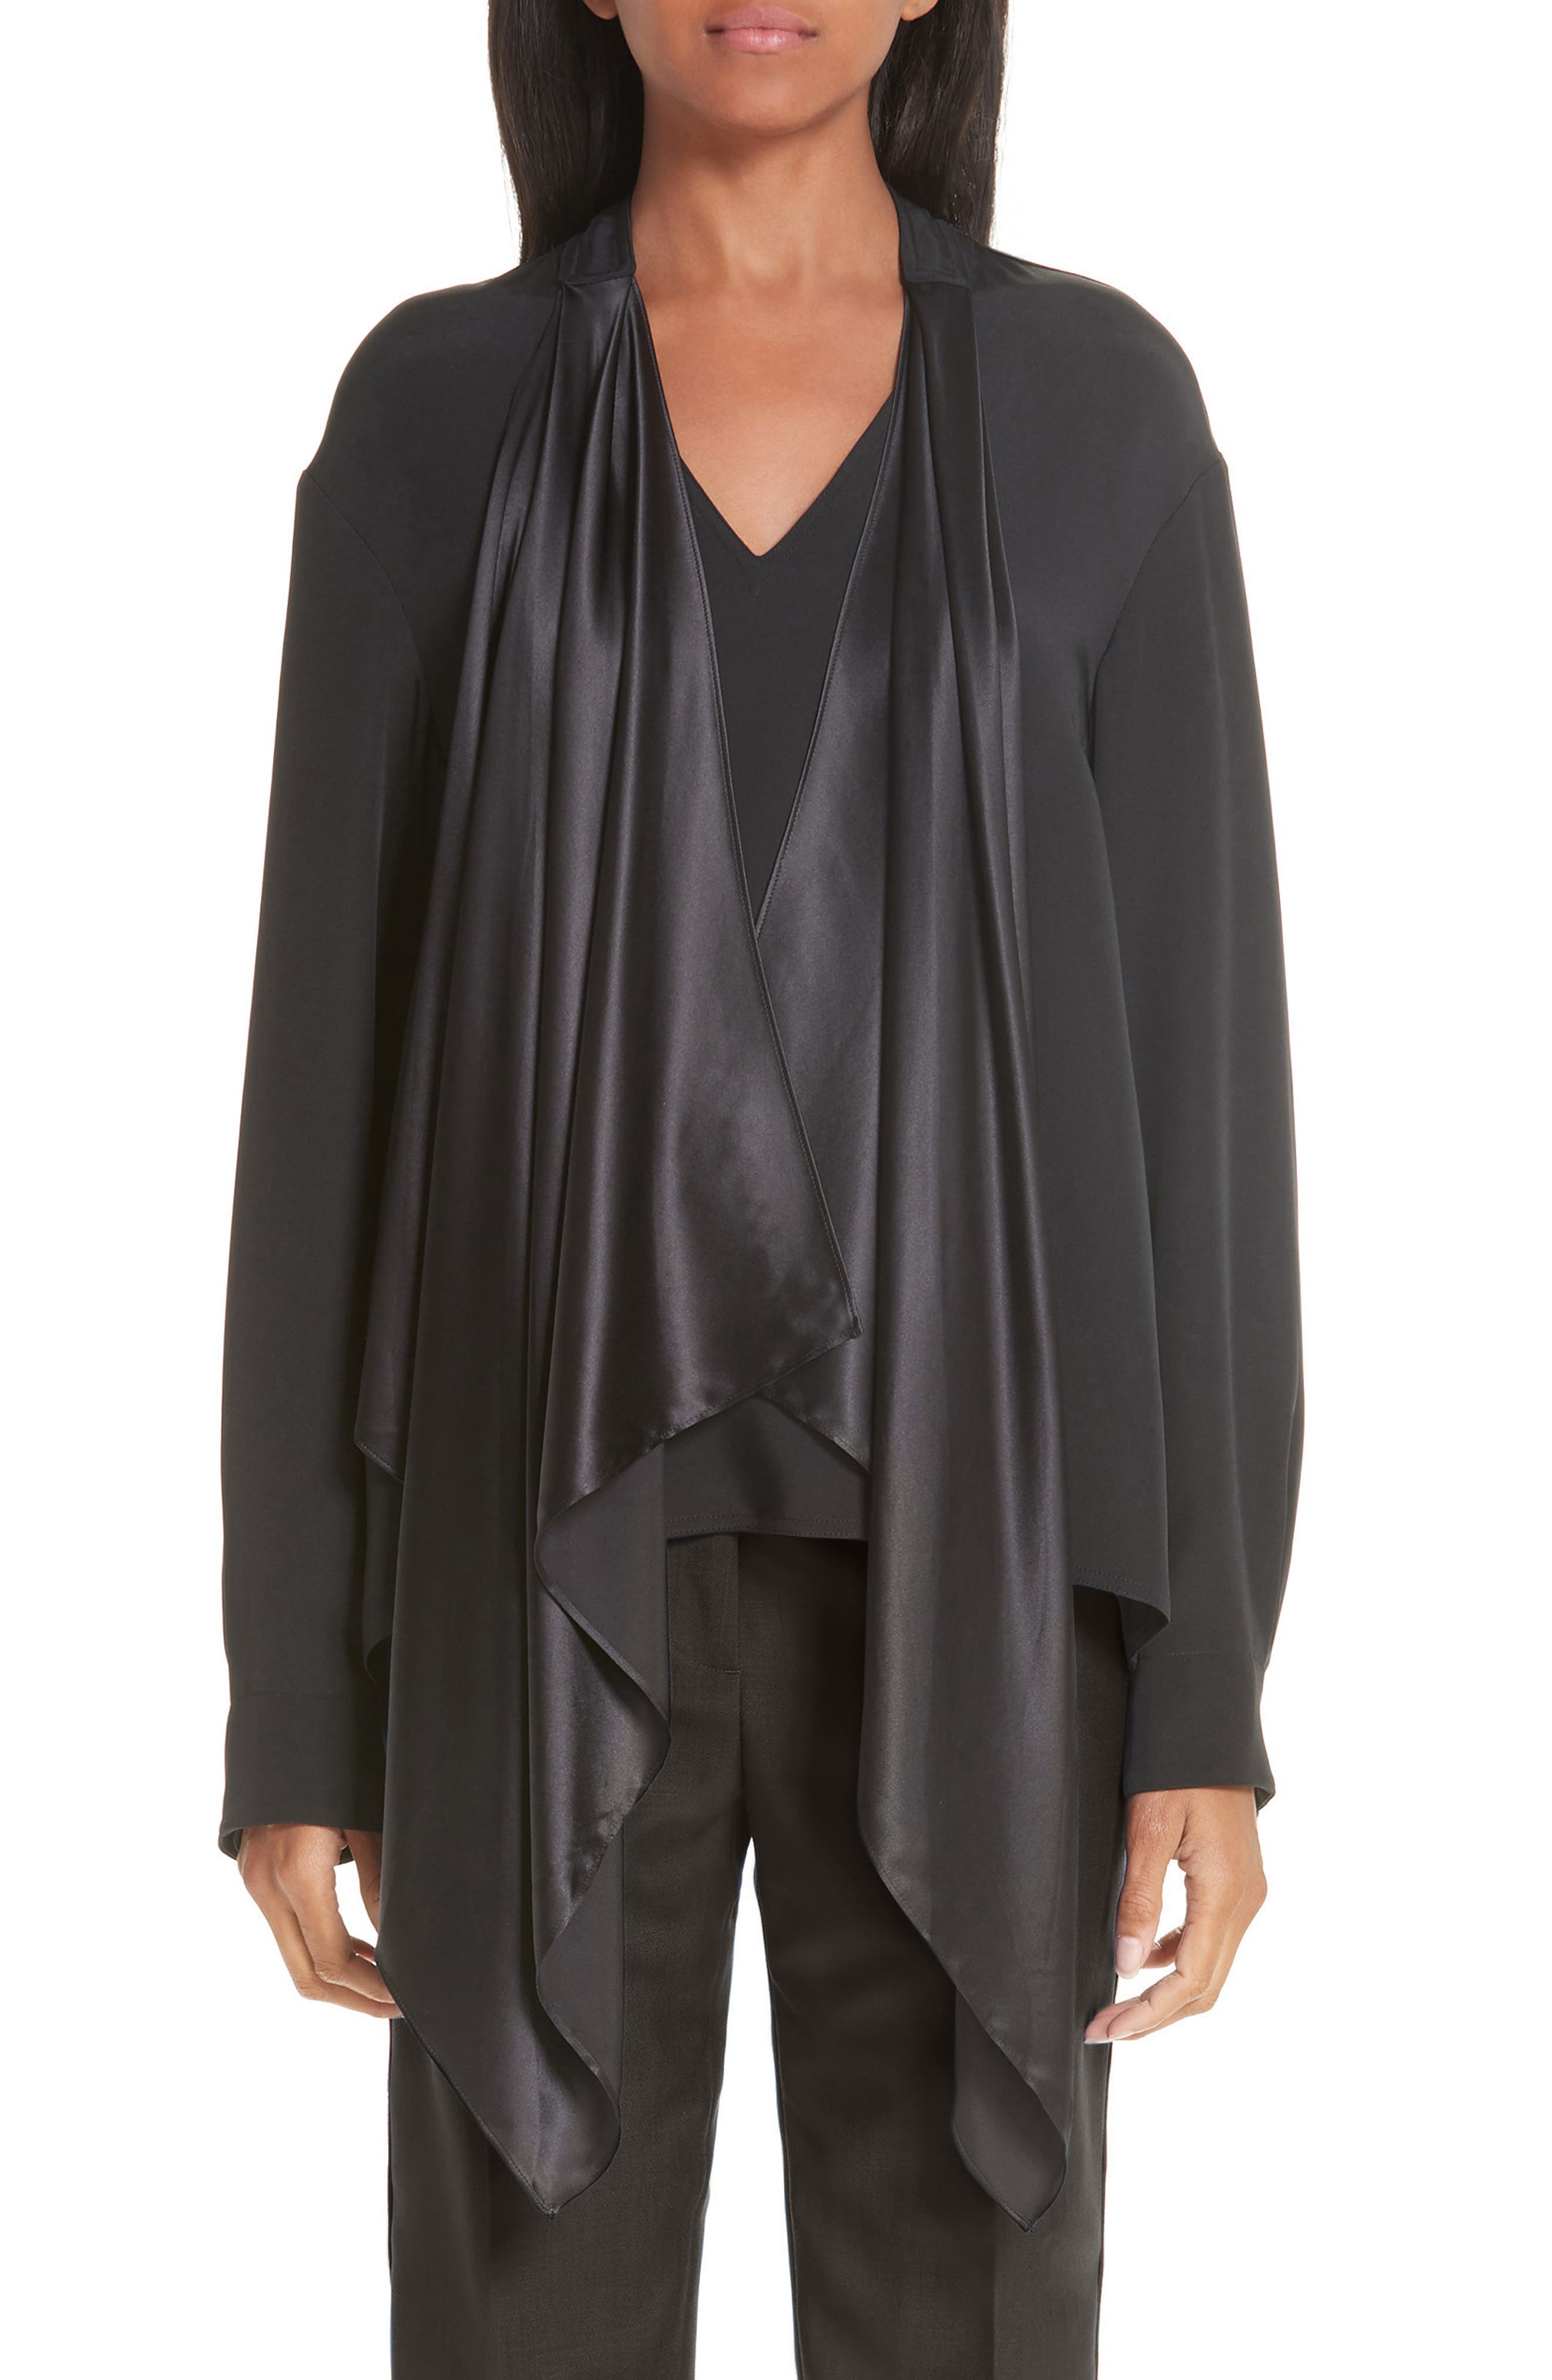 CALVIN KLEIN 205W39NYC, Satin Tie Neck Silk Blouse, Main thumbnail 1, color, BLACK